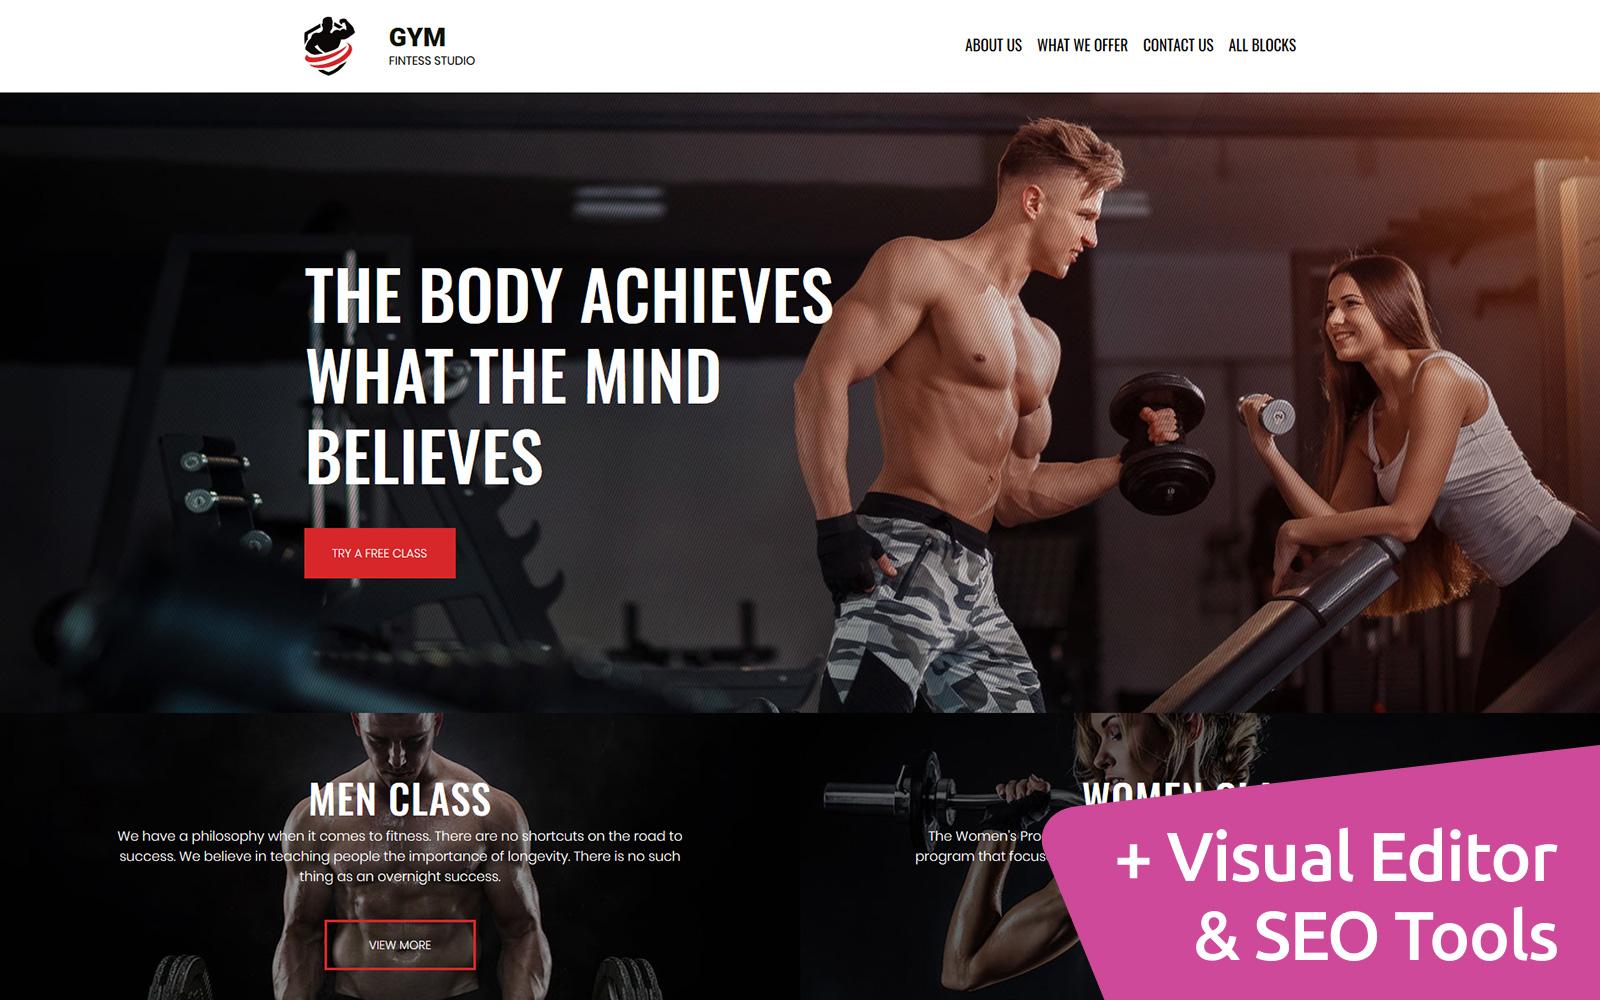 Gym - Fitness Studio №81566